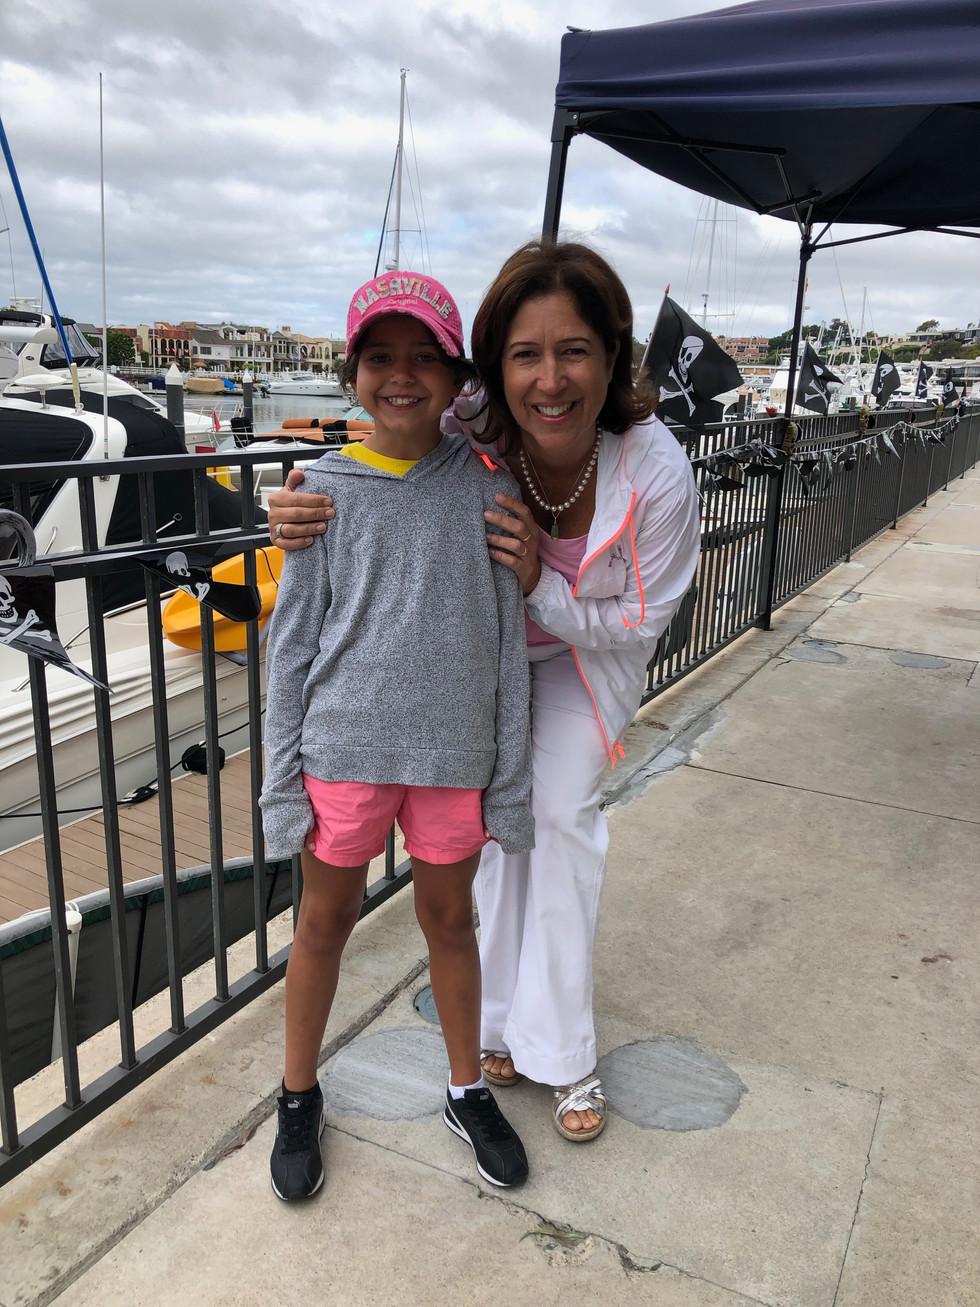 Sophia at Sailing Camp